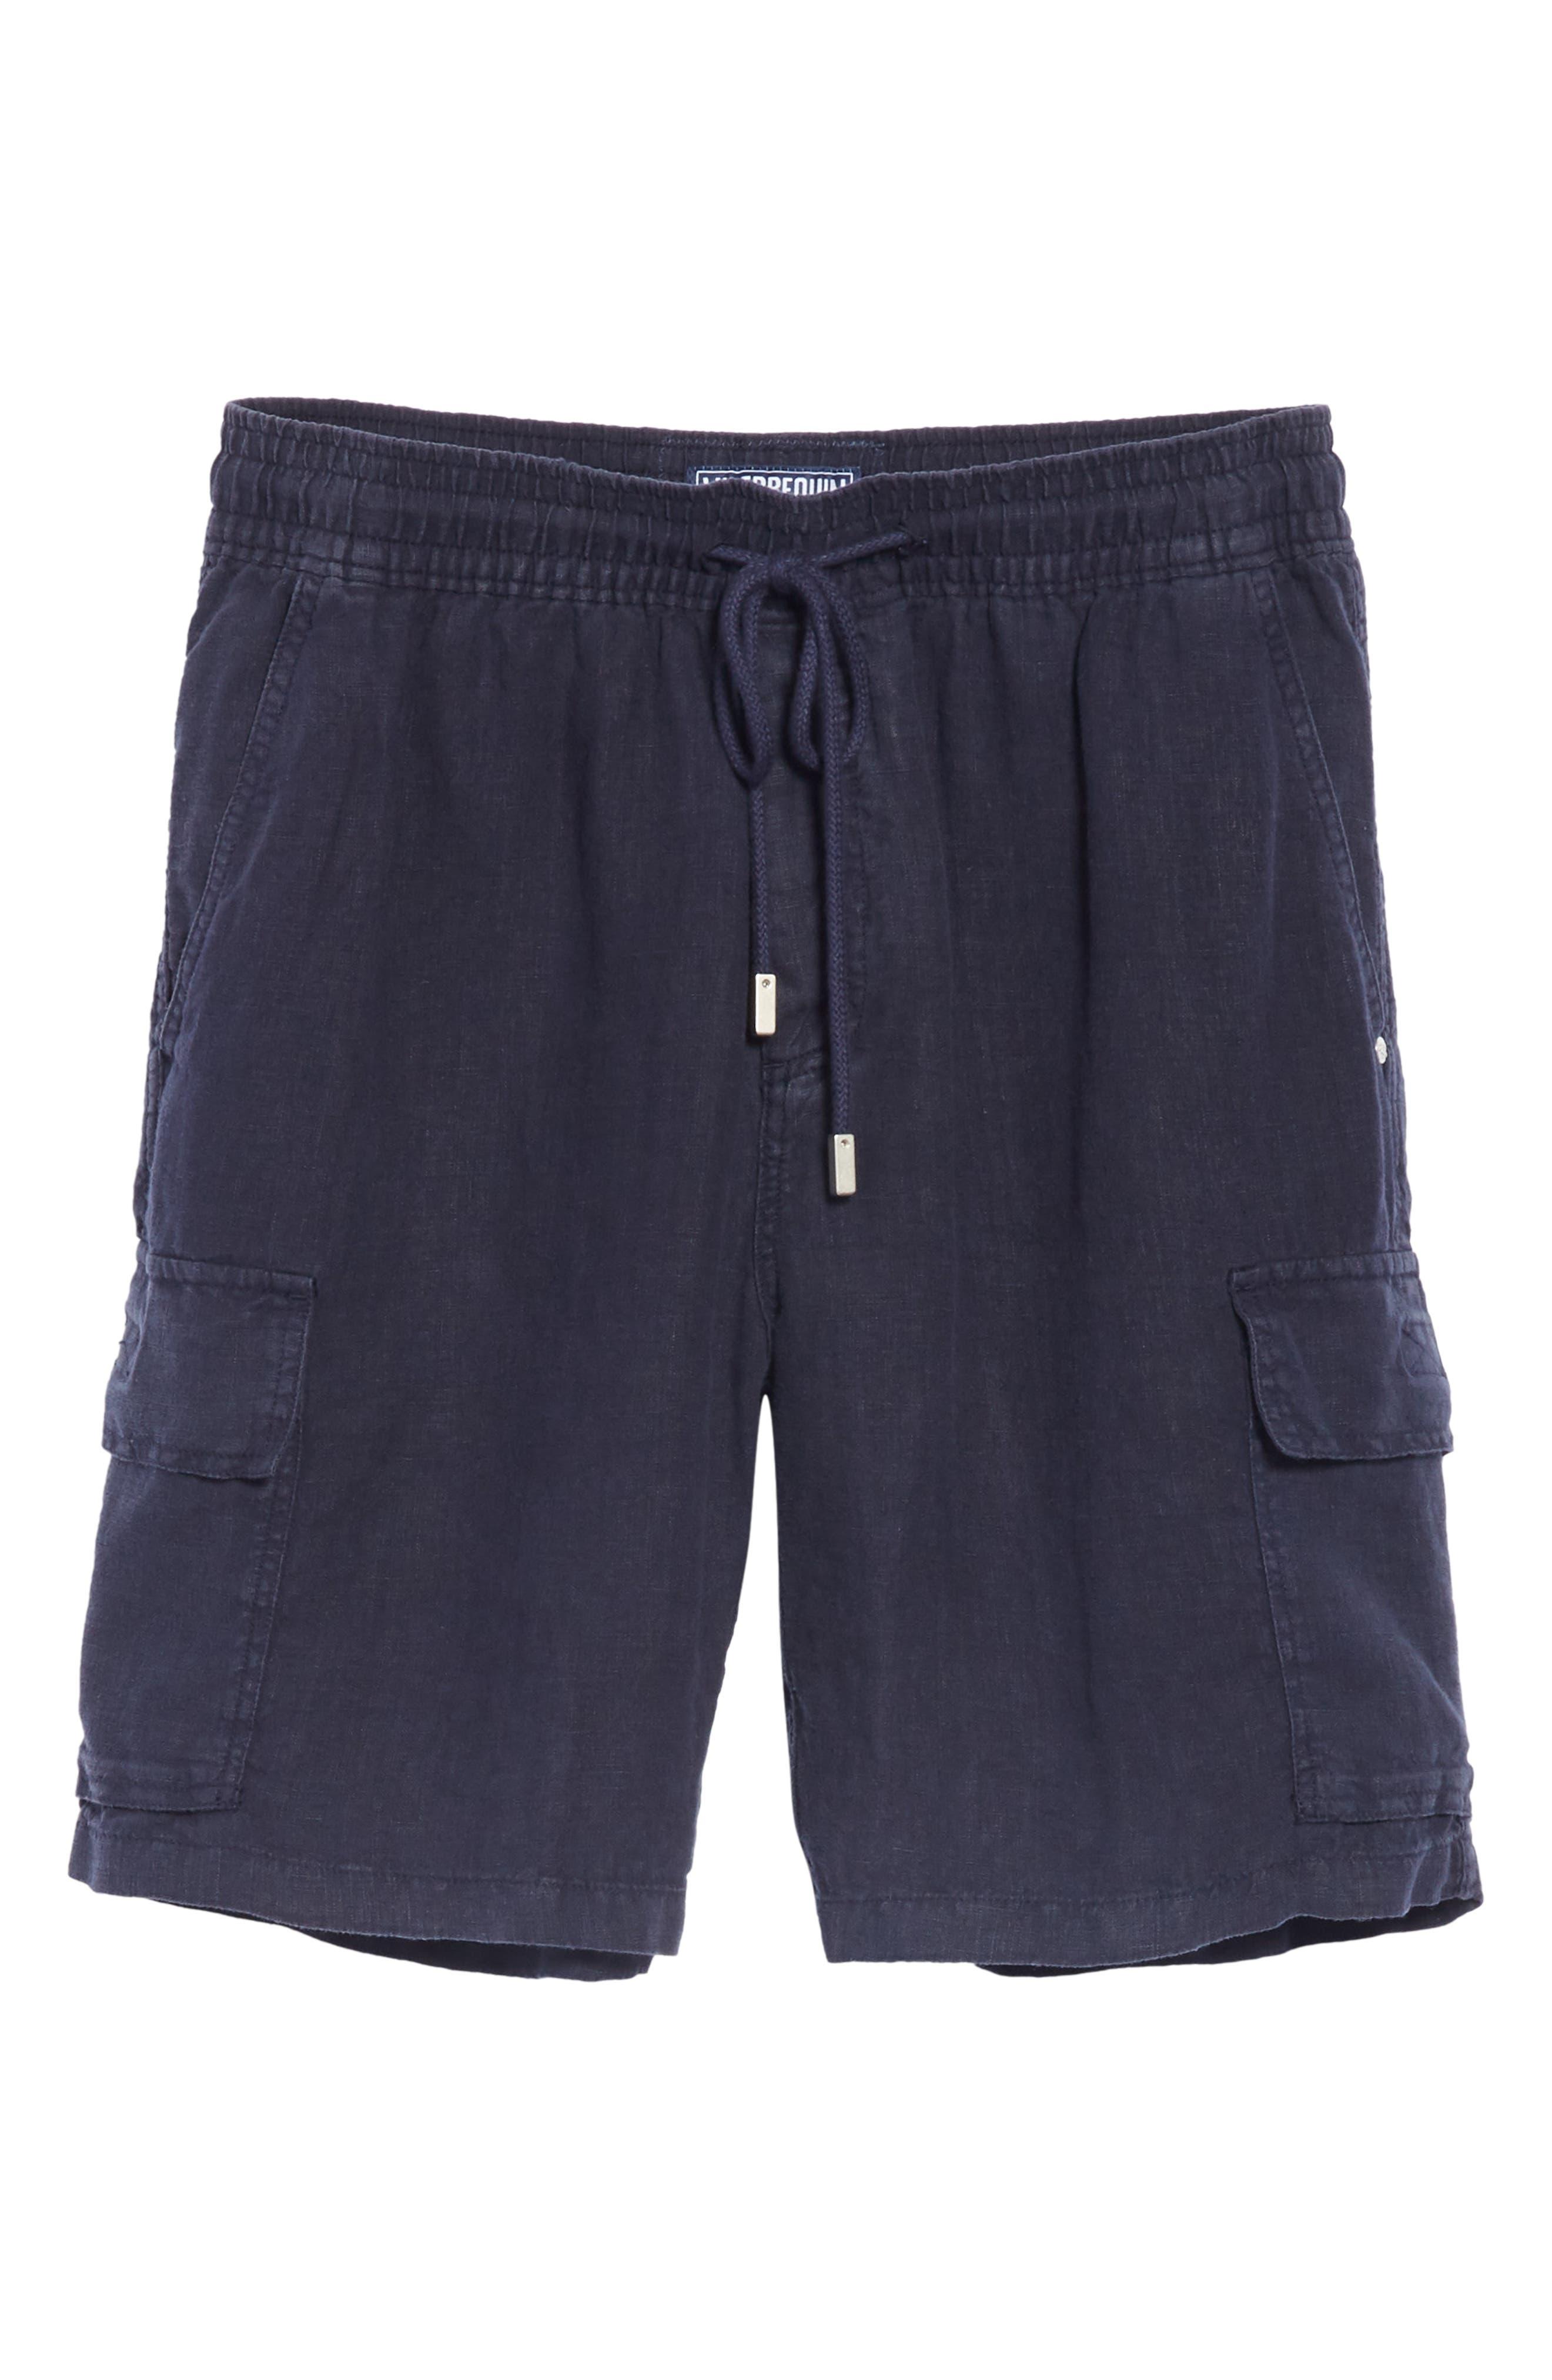 Vilbrequin Linen Cargo Shorts,                             Alternate thumbnail 6, color,                             BLUE